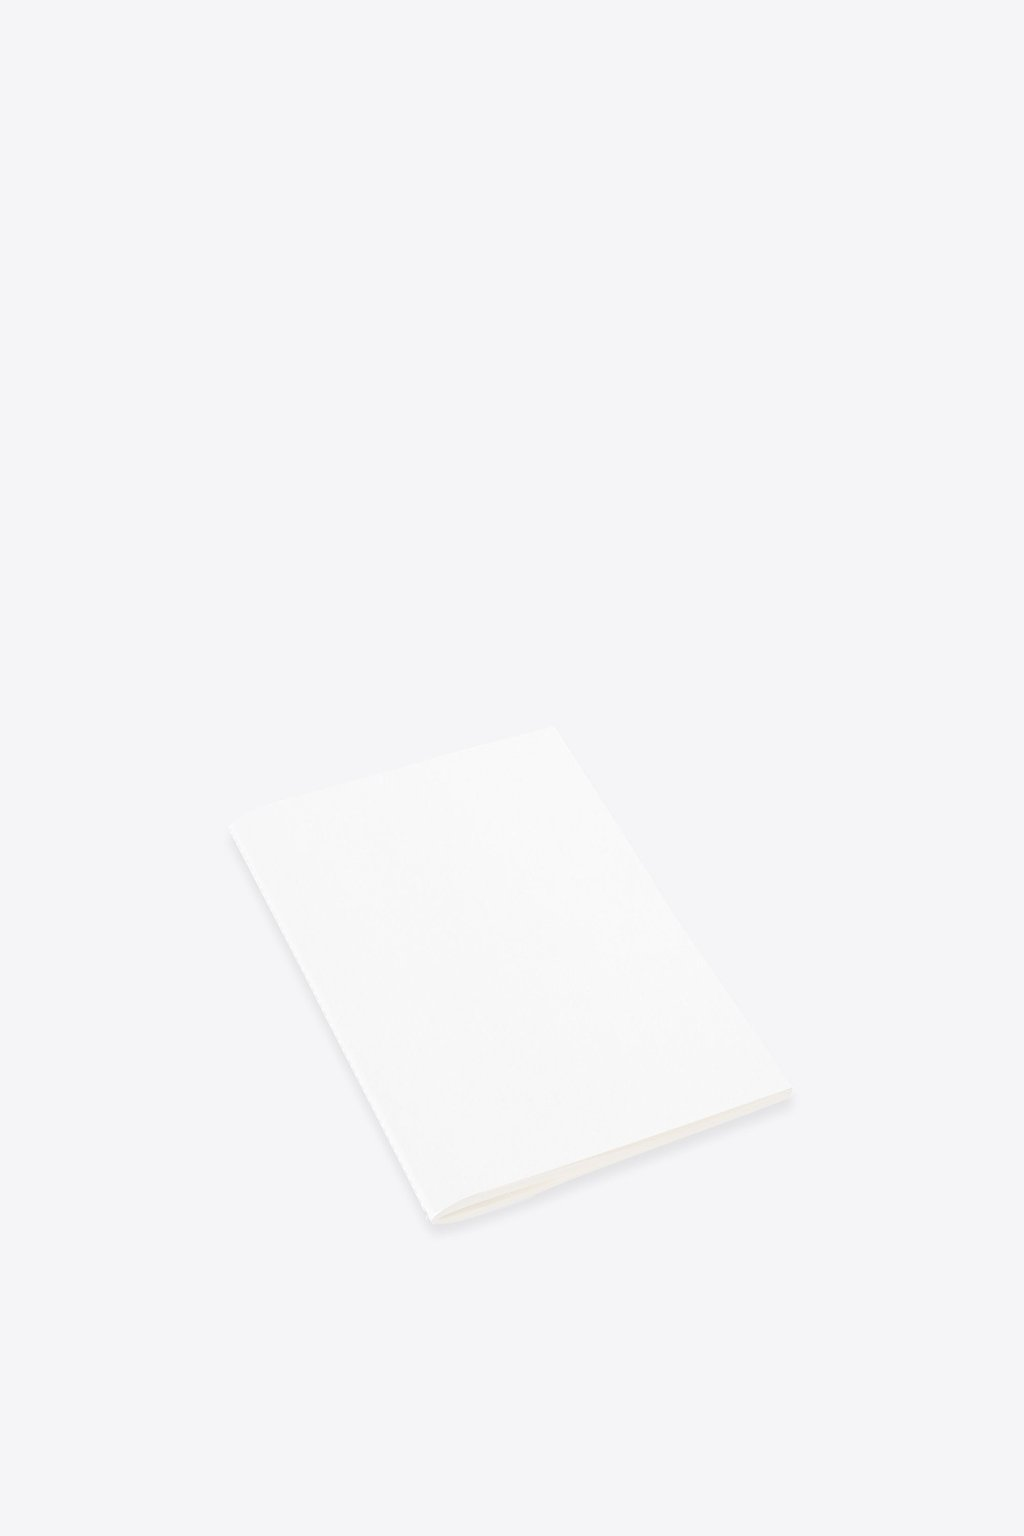 Notebook 1029 White 7